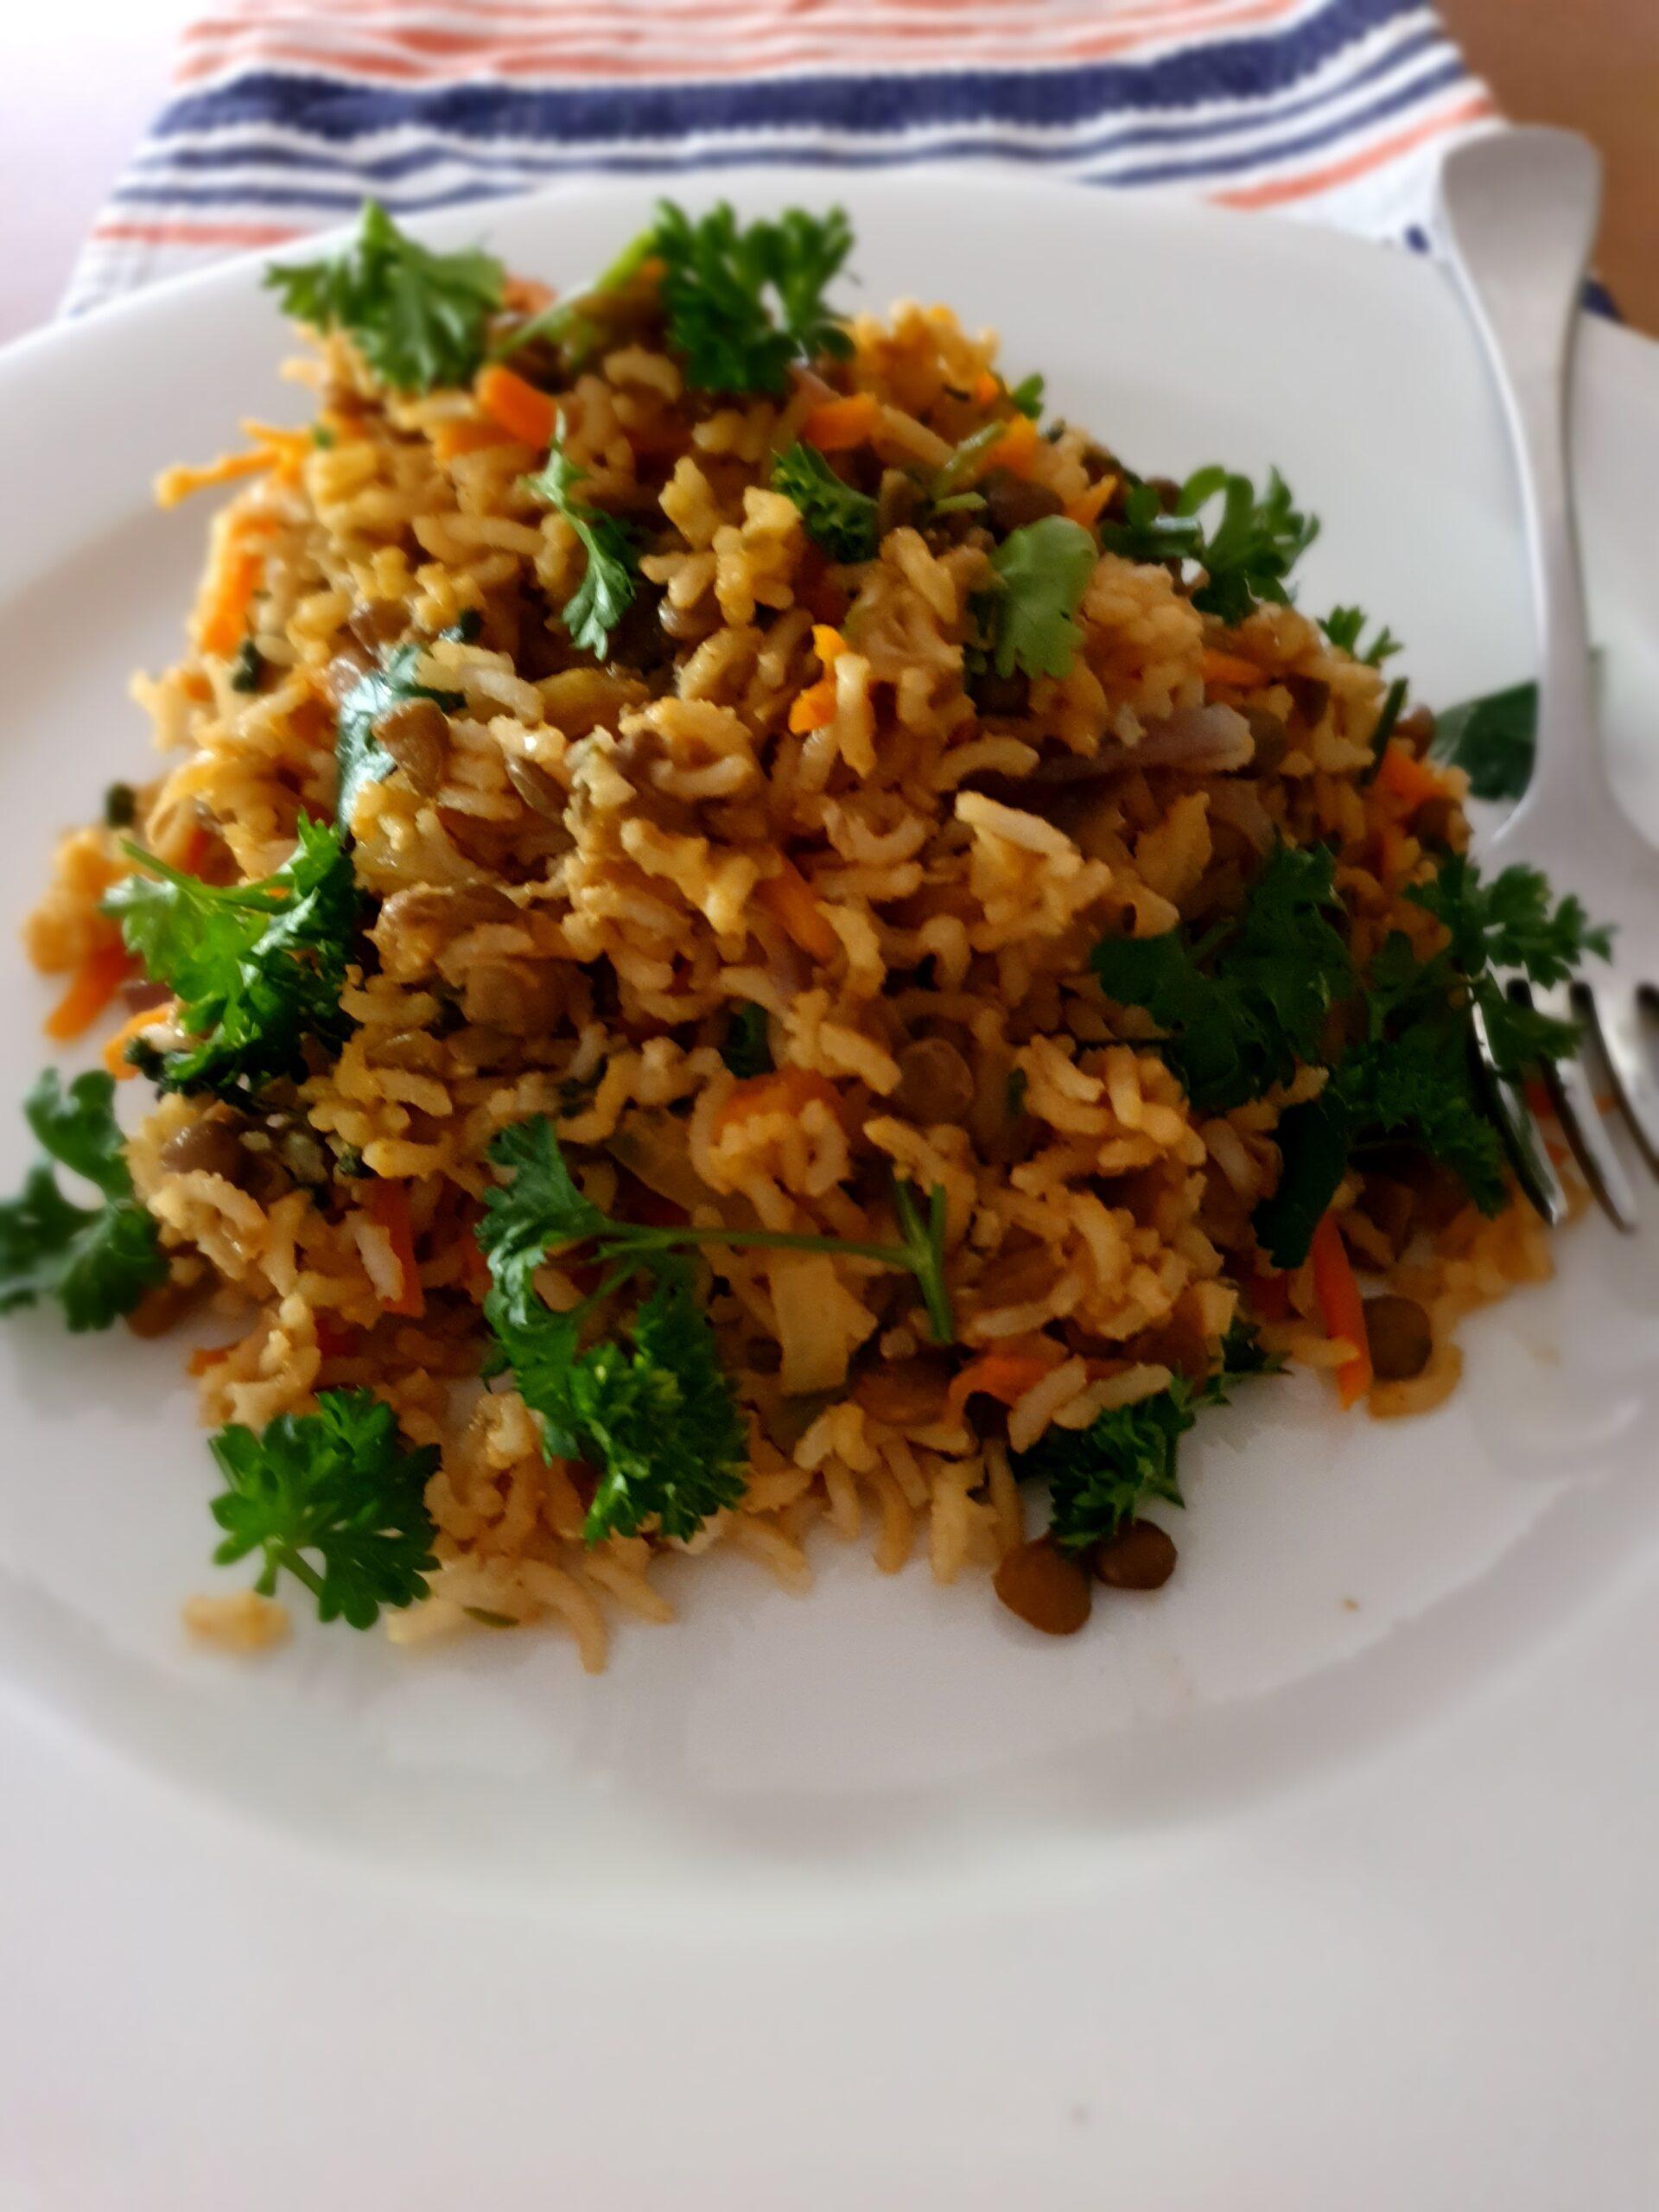 Rice and Lentils (Caramelised Onions) Mujadara